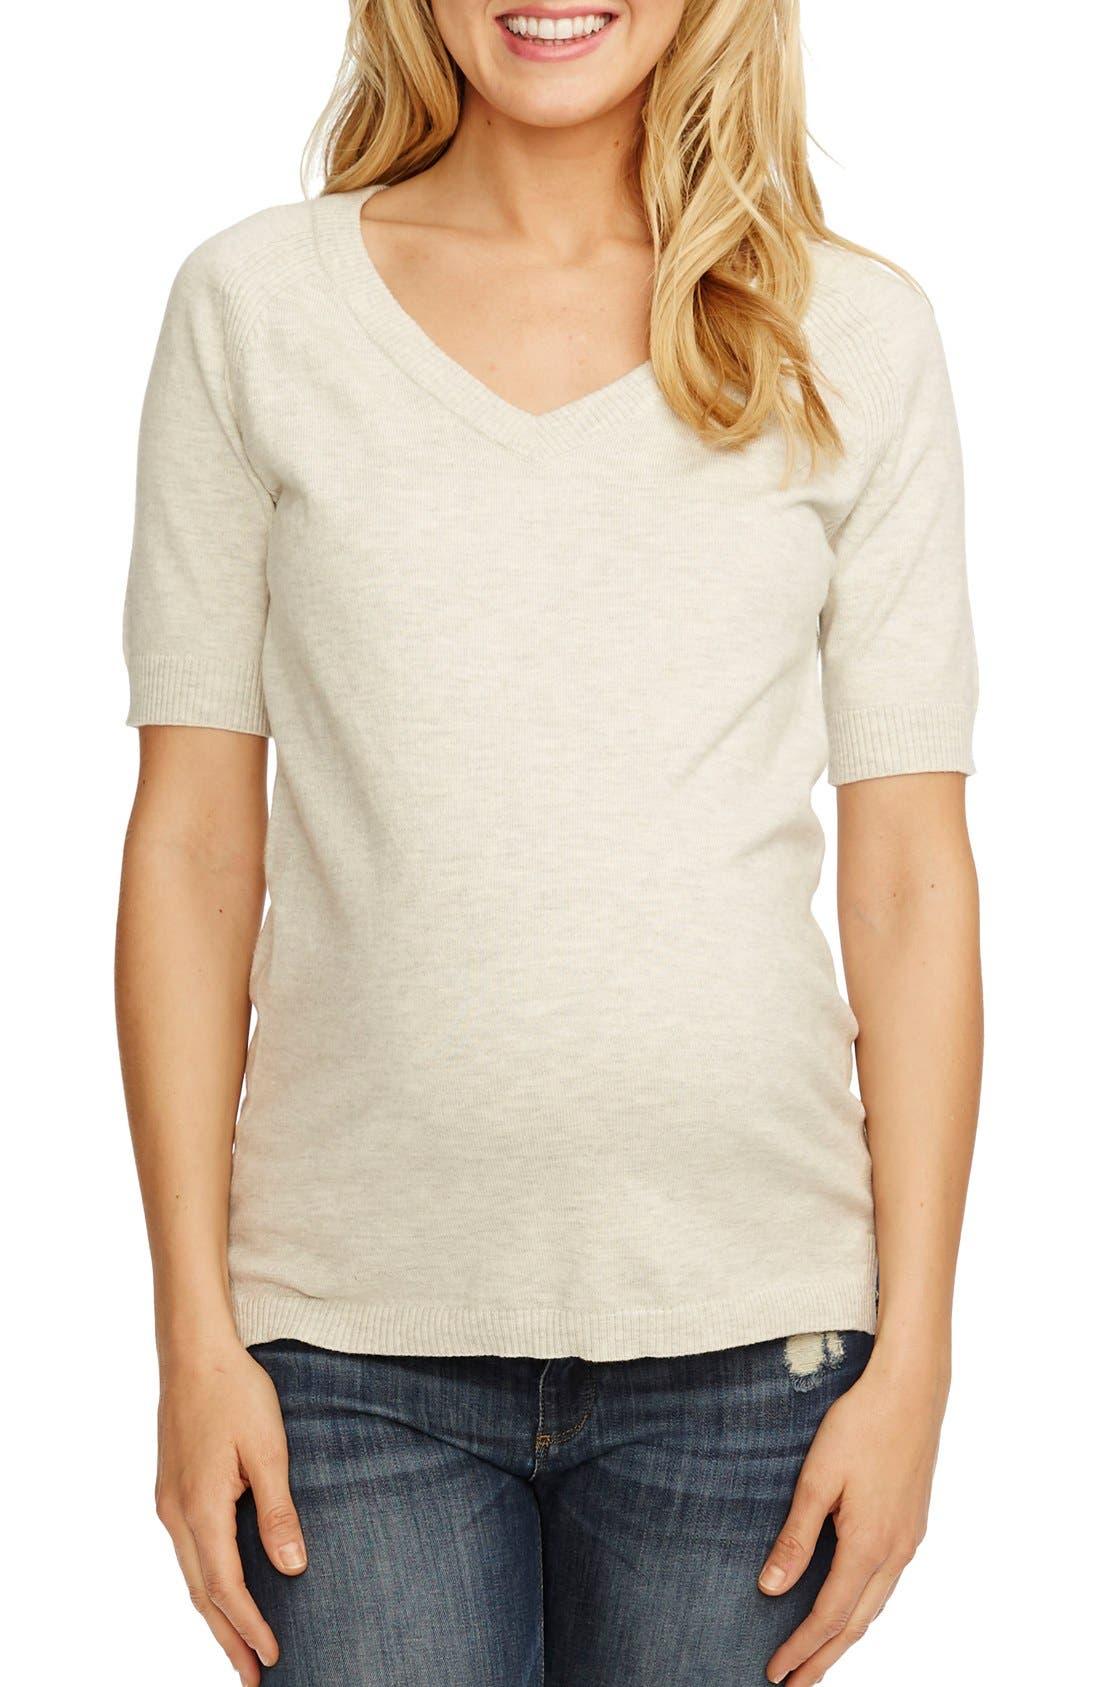 Rosie Pope 'Avery' V-Neck Maternity Sweater